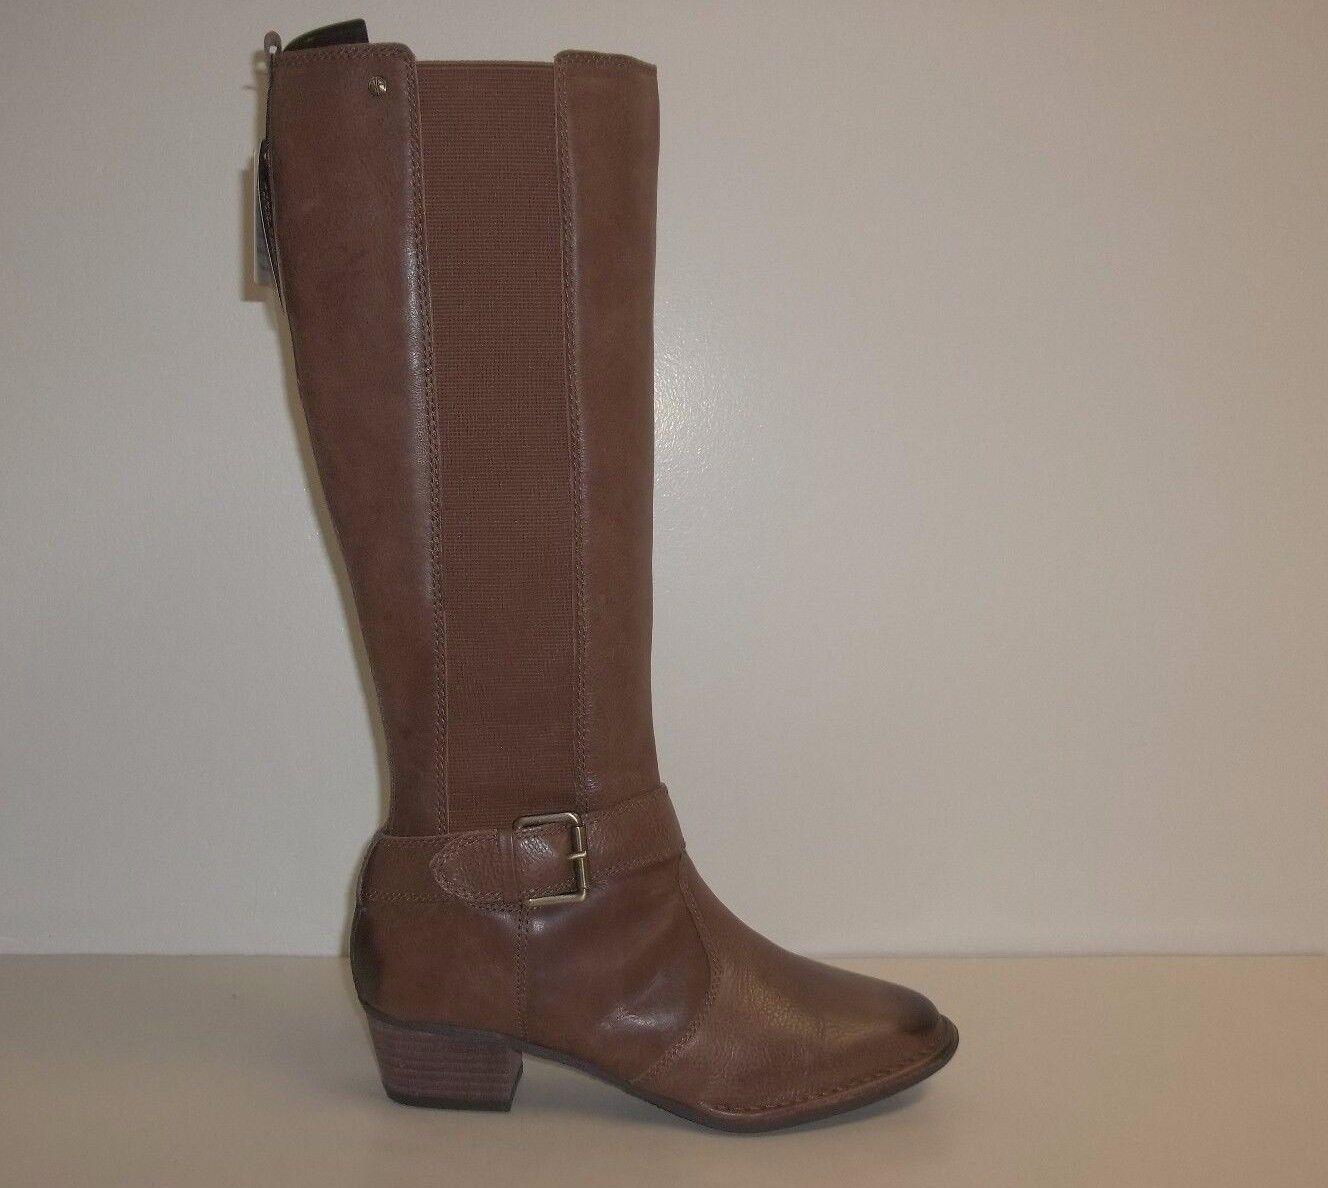 Giani Bernini Größe 6.5 M ALLCOTT Nut Braun Leder Stiefel NEU Damenschuhe Schuhes NWOB